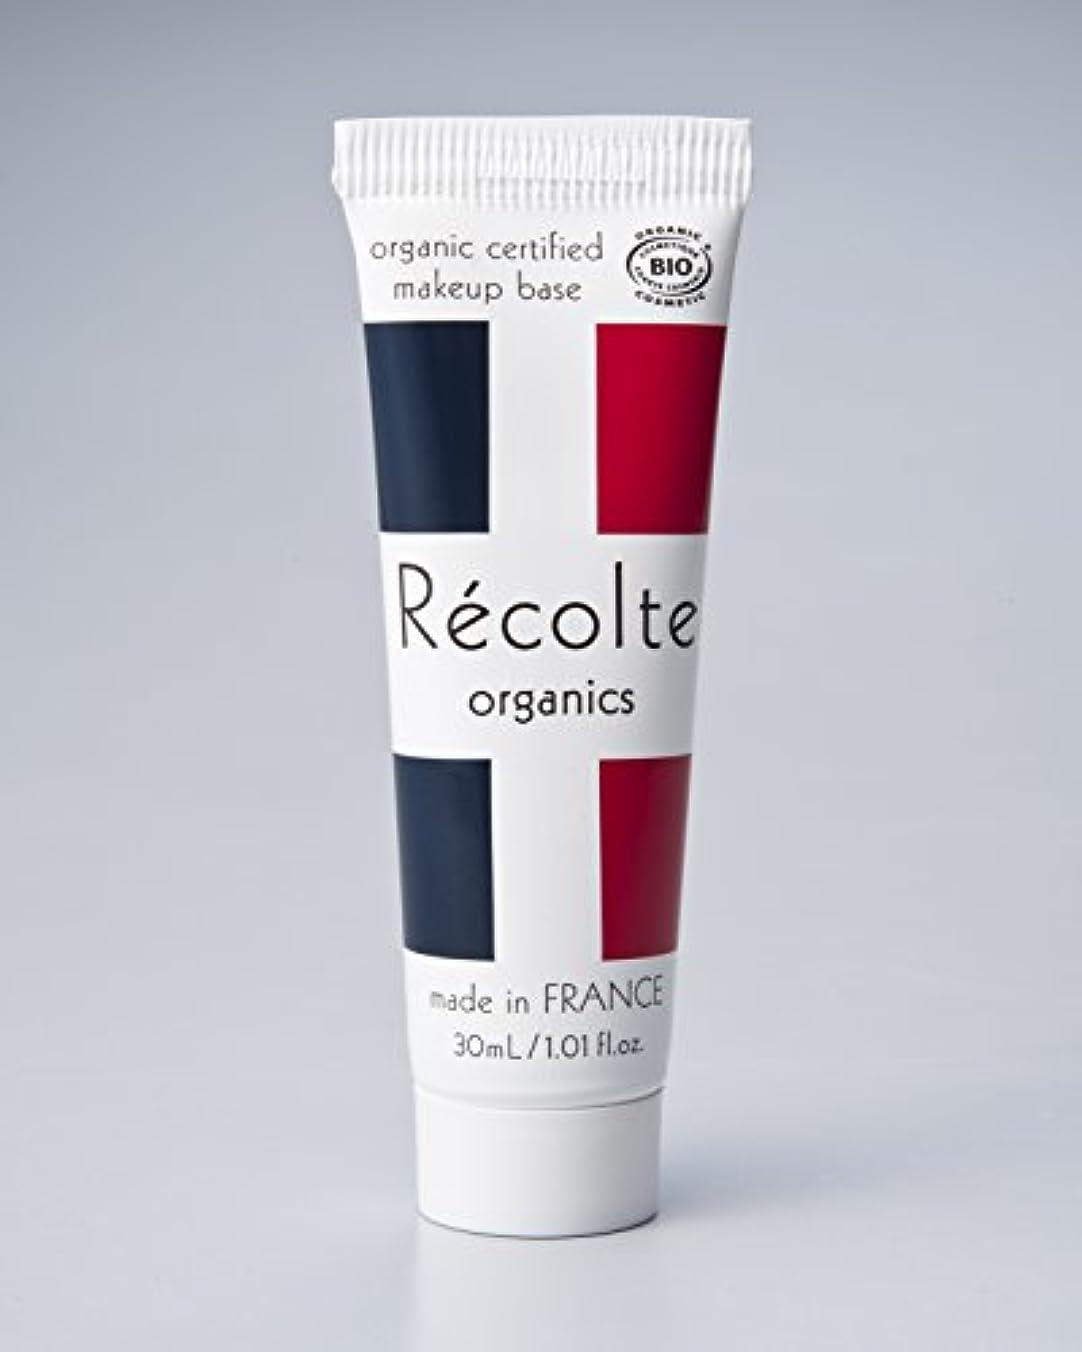 Recolte organics natural makeup base レコルトオーガニック ナチュラルメイクアップベース 化粧下地 SPF15 30ml